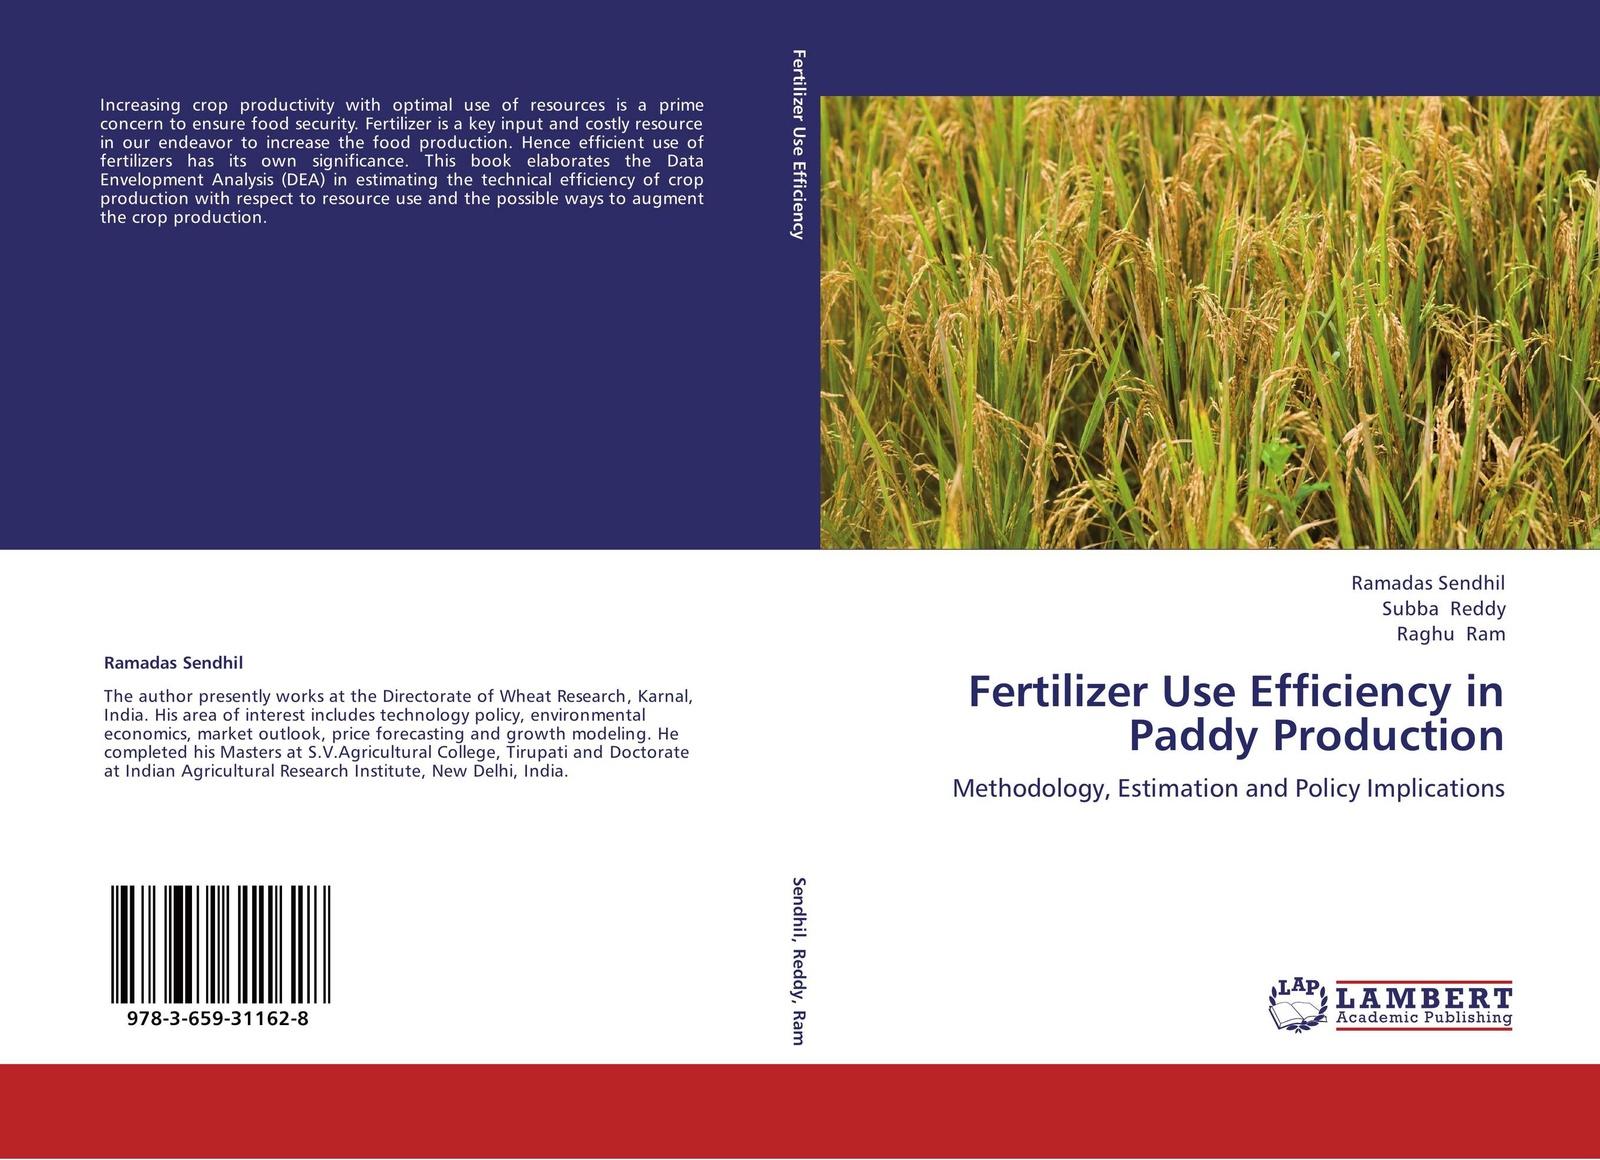 лучшая цена Ramadas Sendhil,Subba Reddy and Raghu Ram Fertilizer Use Efficiency in Paddy Production